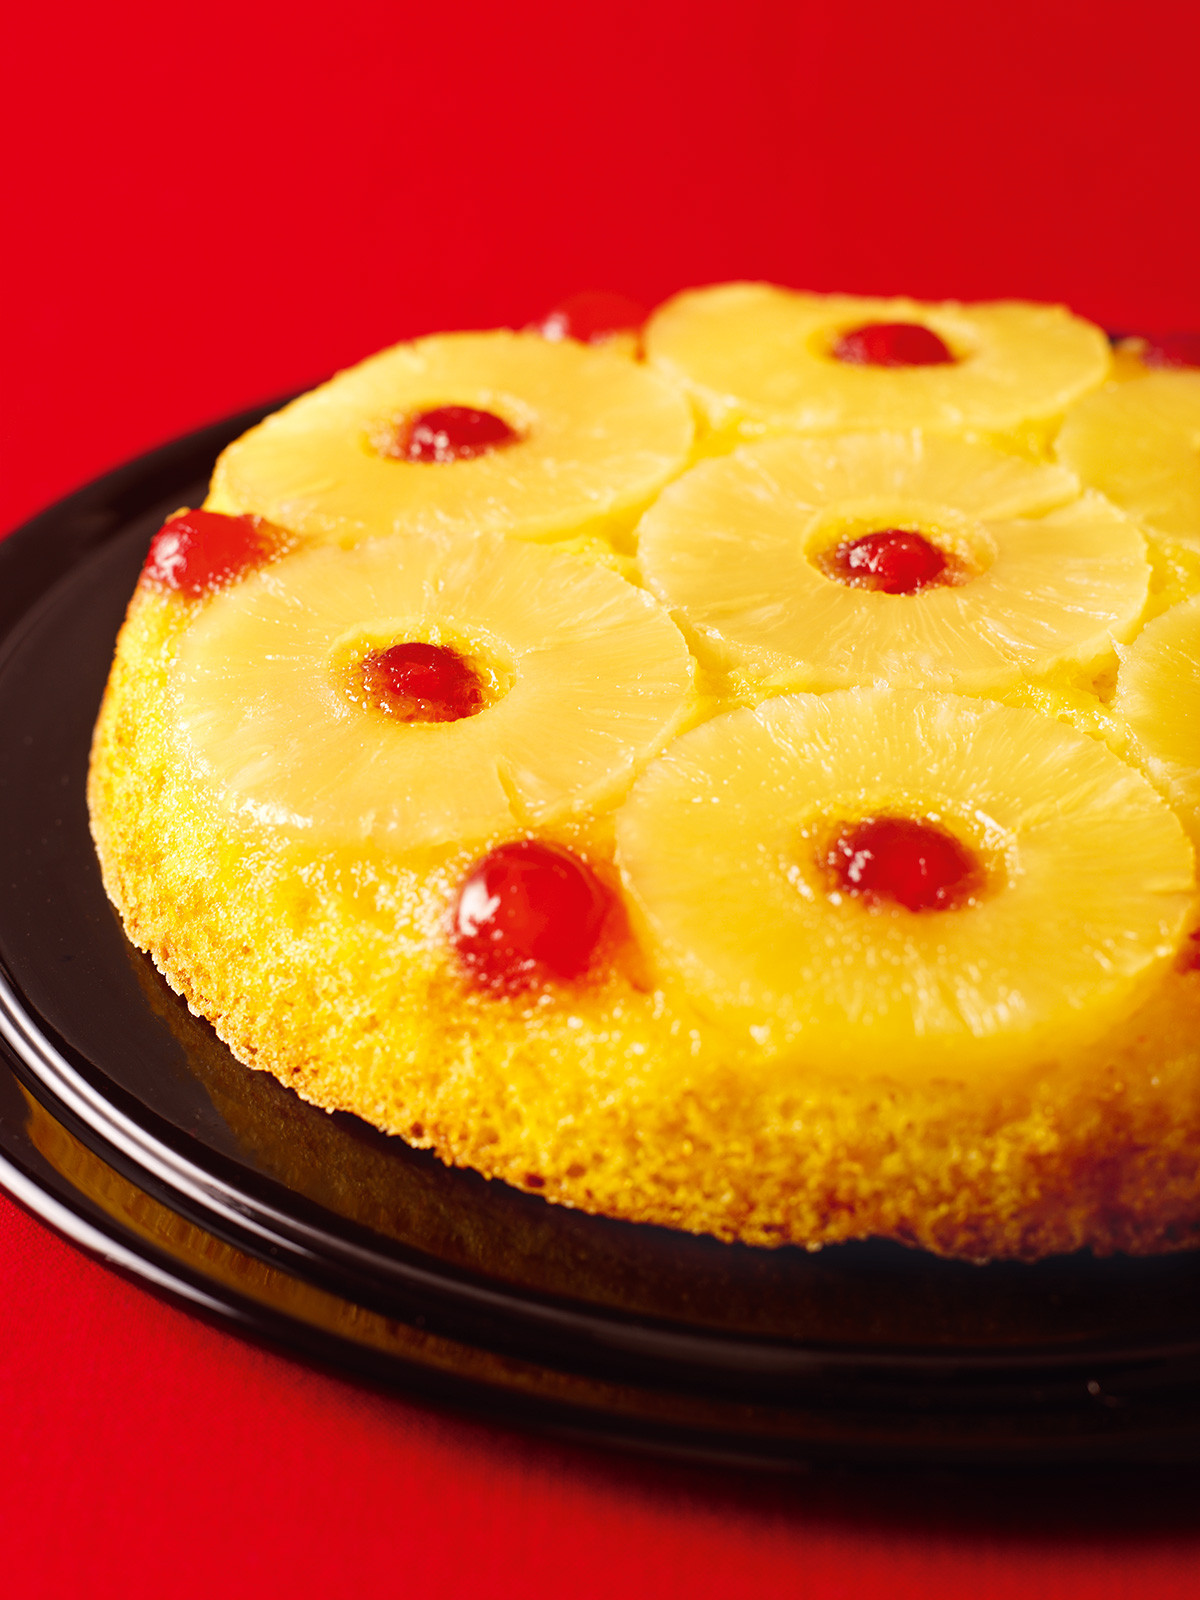 Recipe For Pineapple Upside Down Cake  Pineapple Upside Down Cake Nigella s Recipes